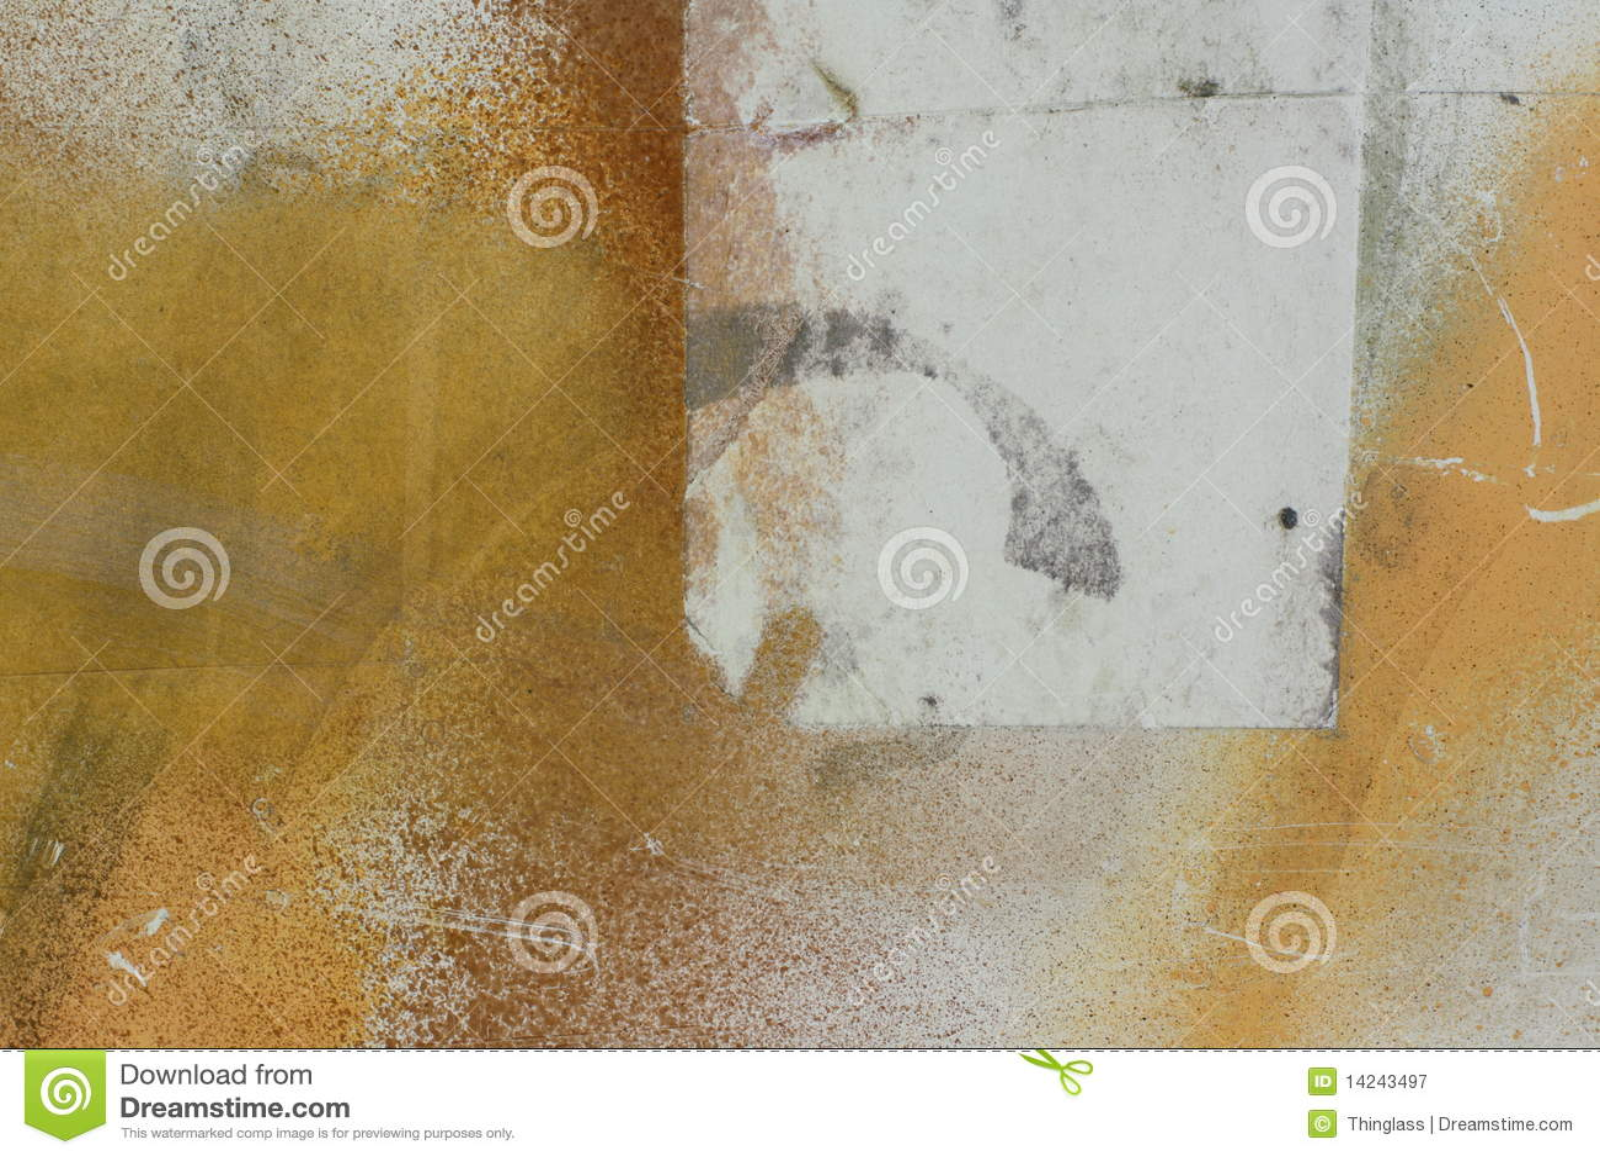 Pintura de aerosol en el papel